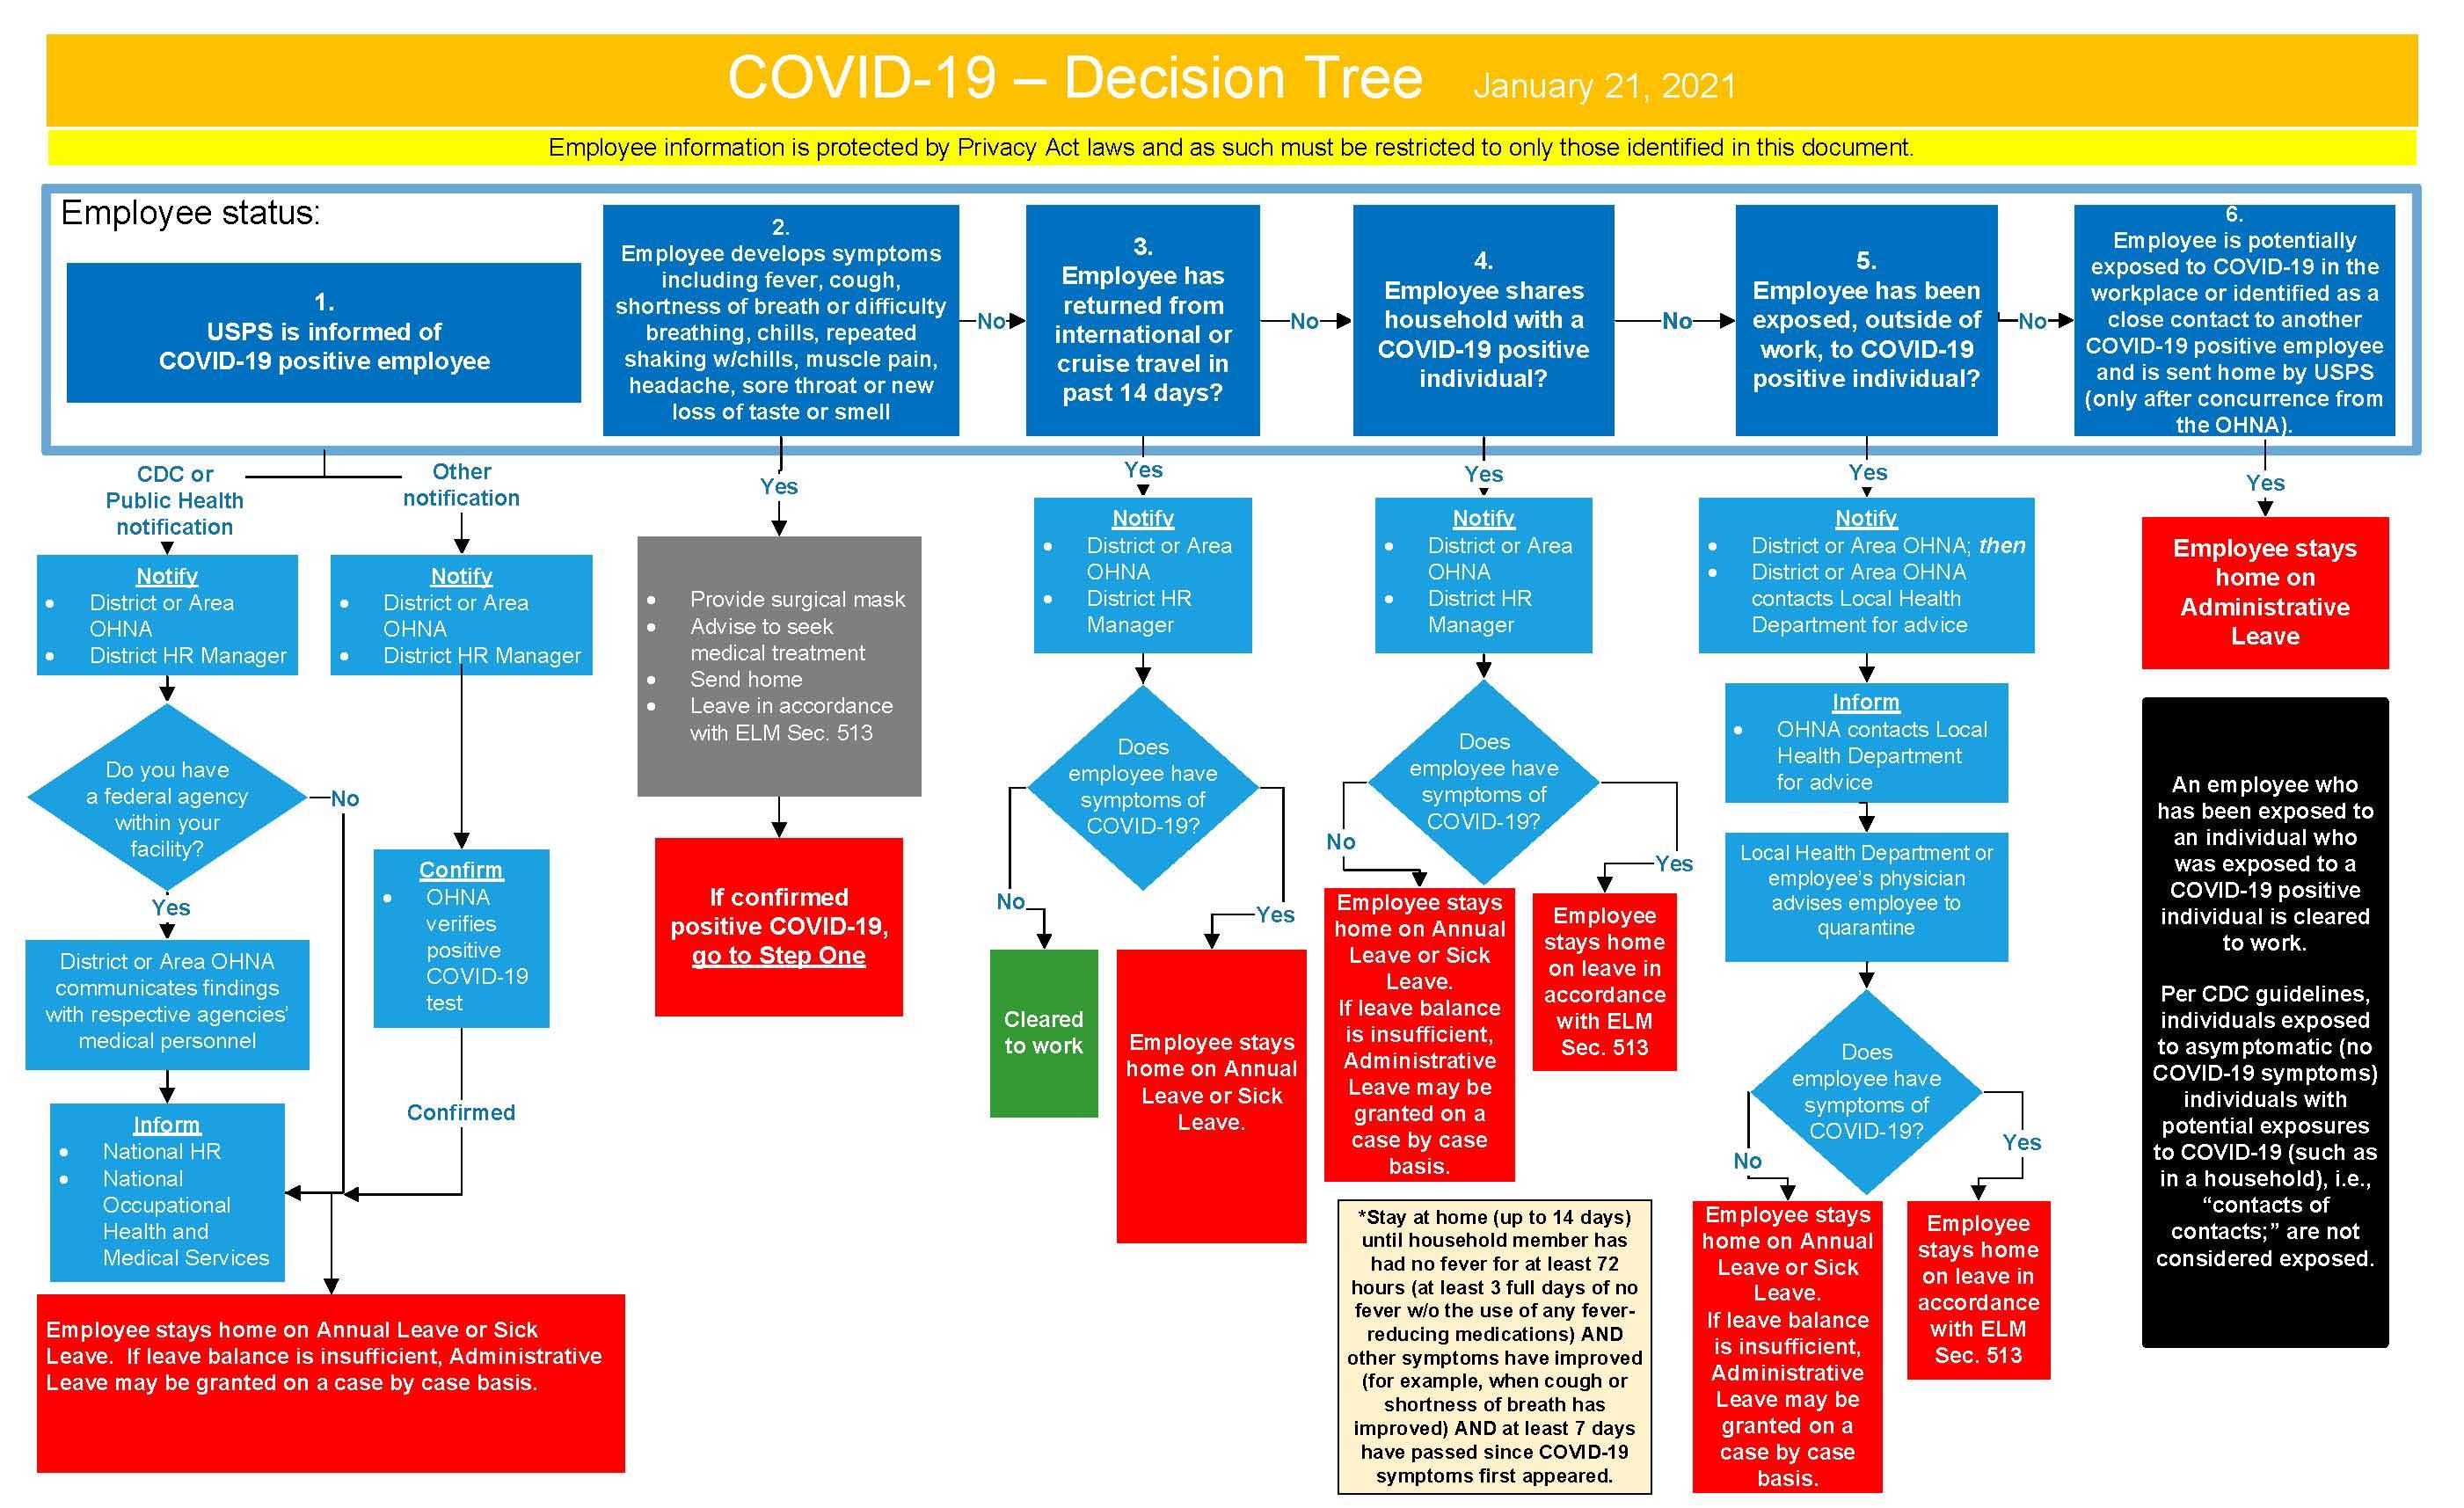 https://www.wapwu.org/WR/SRC/COVID-19%20Decision%20Tree%20January%2021_2021%20v2.jpg